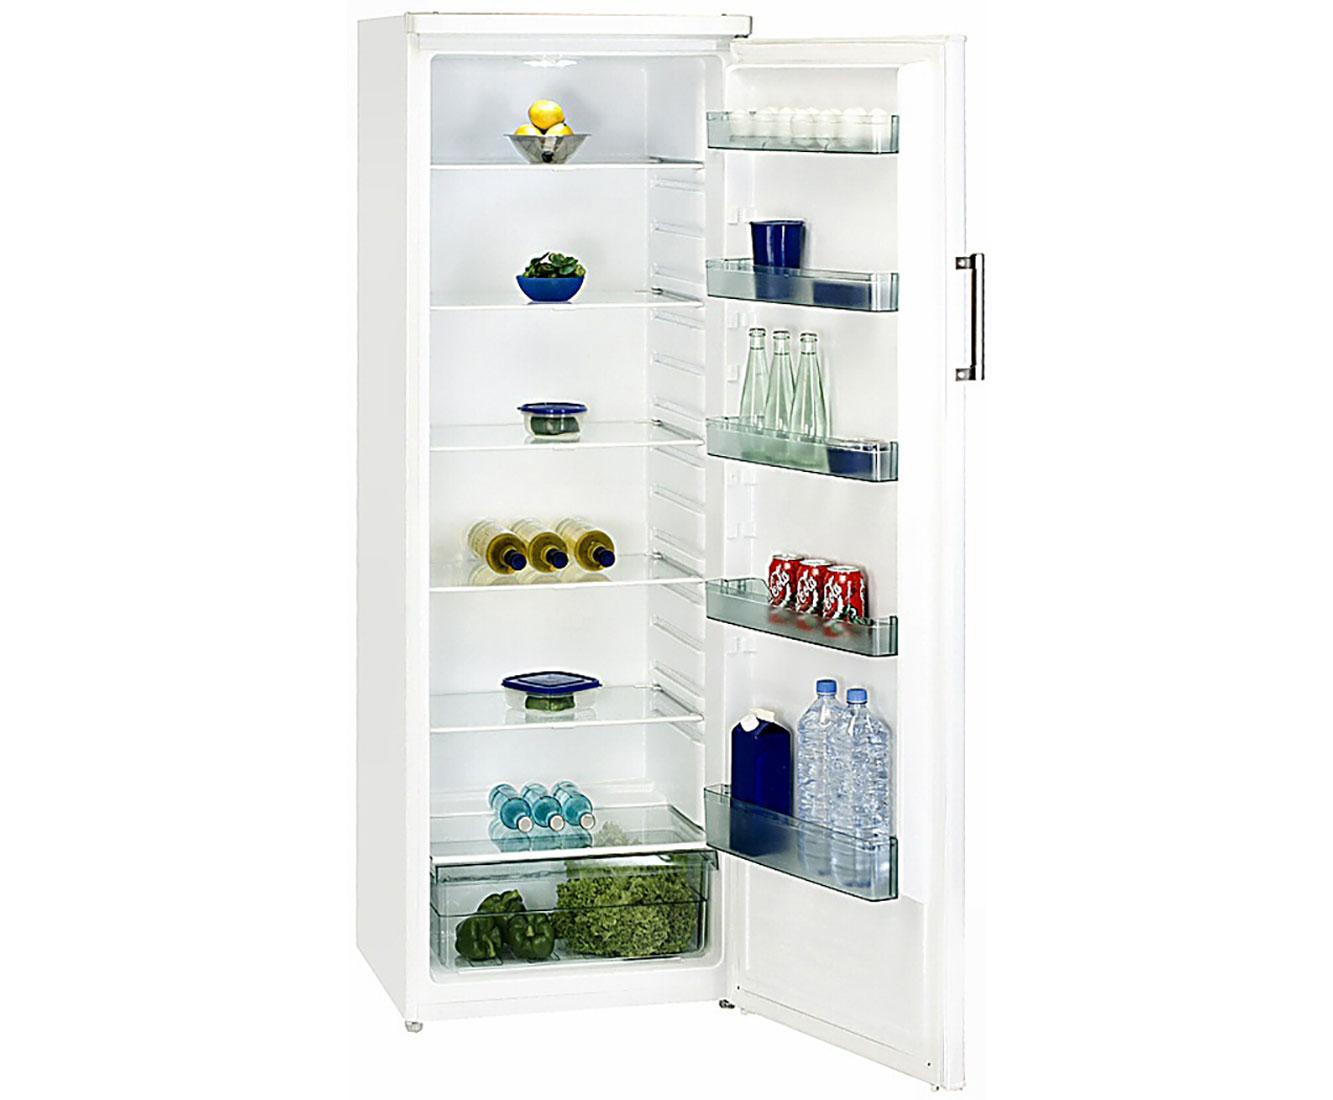 Respekta Retro Kühlschrank Test : Maße kühlschrank freistehend retro kühlschrank test die besten